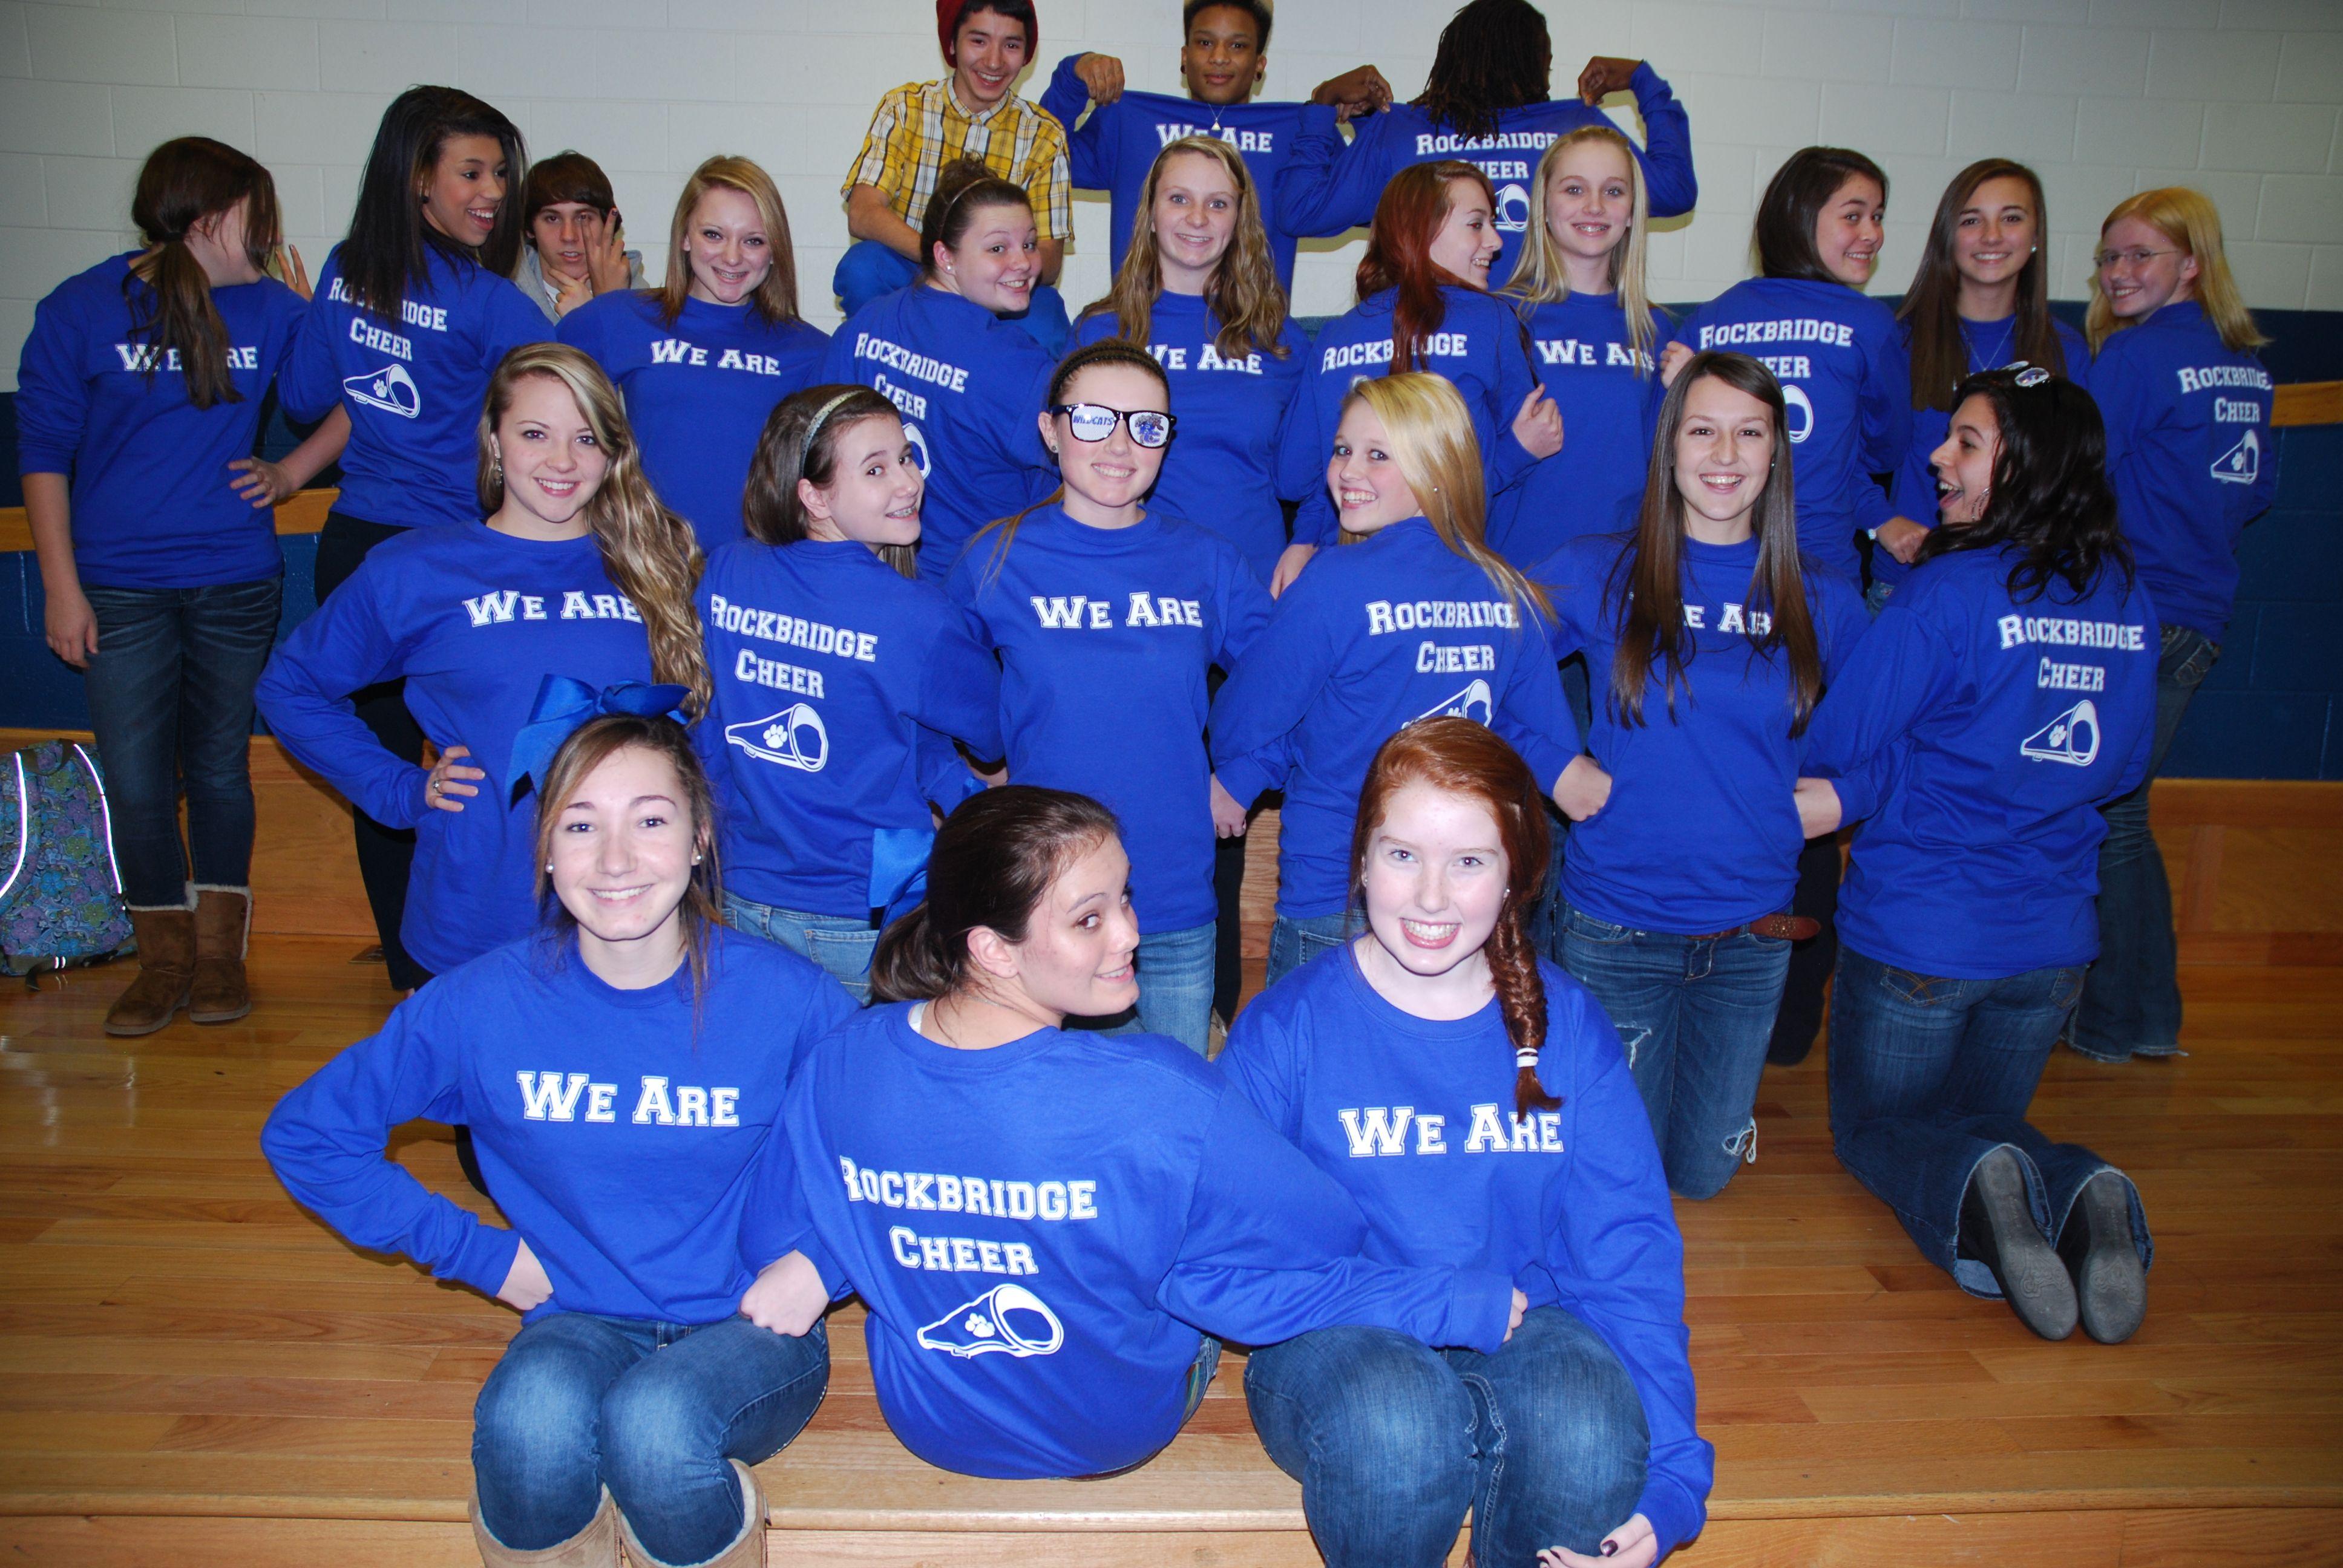 Cheer Shirt Design Ideas cheer mom bow We Are Rockbridge Cheer T Shirt Photo